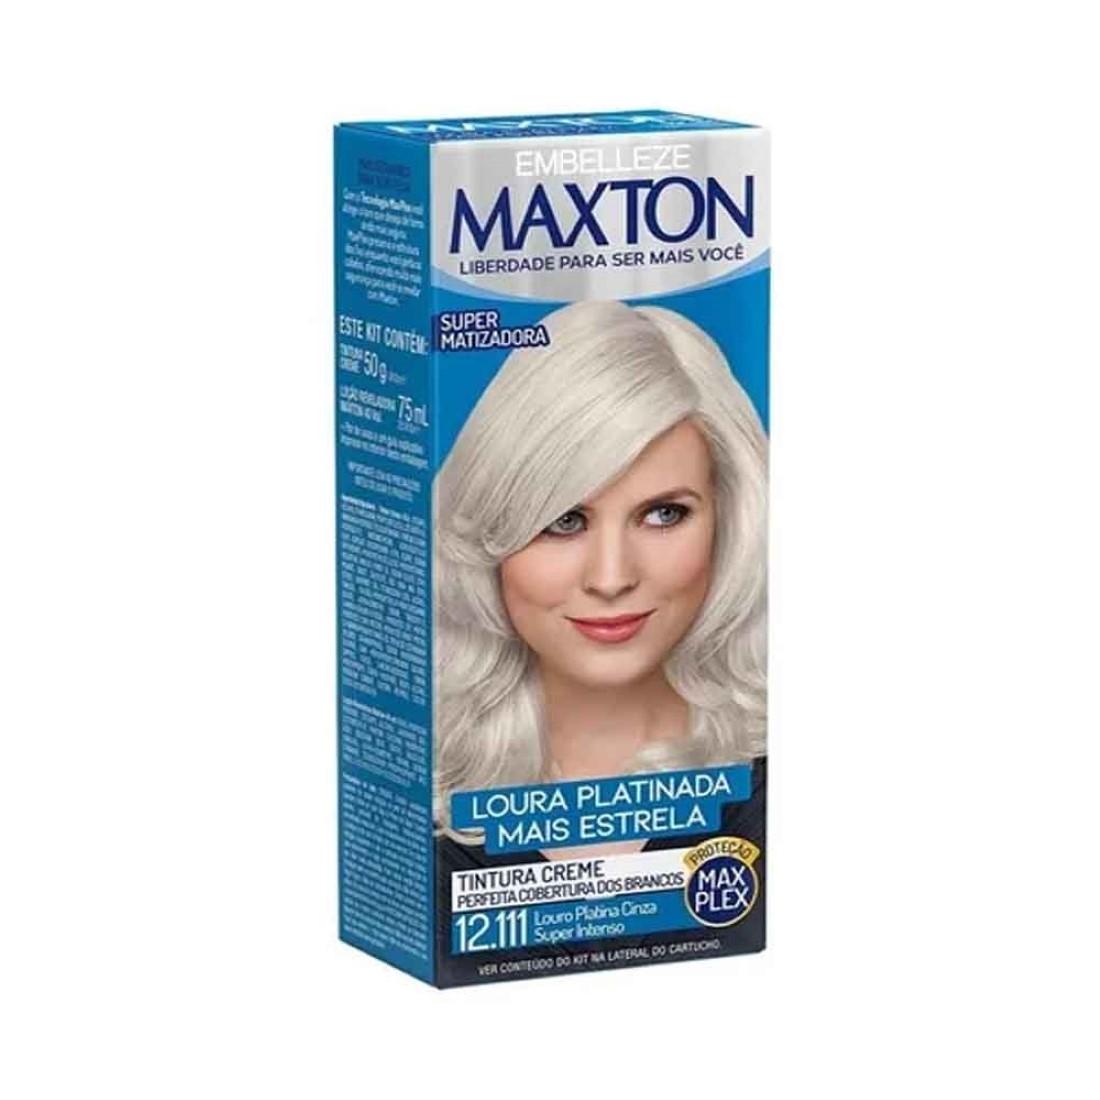 Kit Prático Tintura Creme Maxton 12.111 Louro Platina Cinza Super Intenso - Embelleze